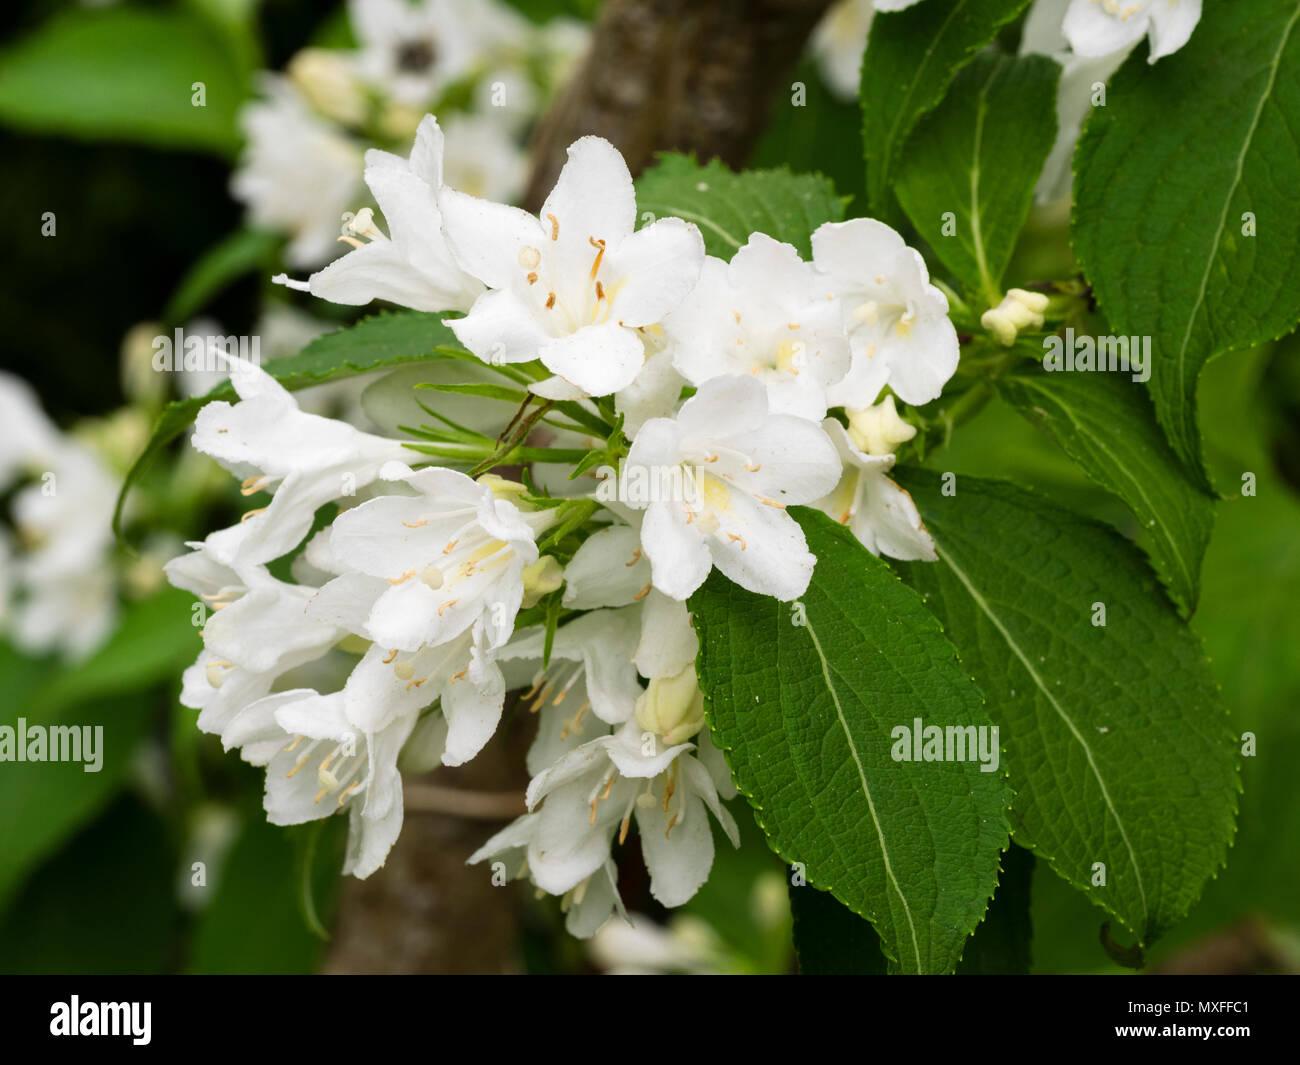 White flowers of the hardy, early summer flowering garden shrub, Weigela florida 'Snowflake' - Stock Image